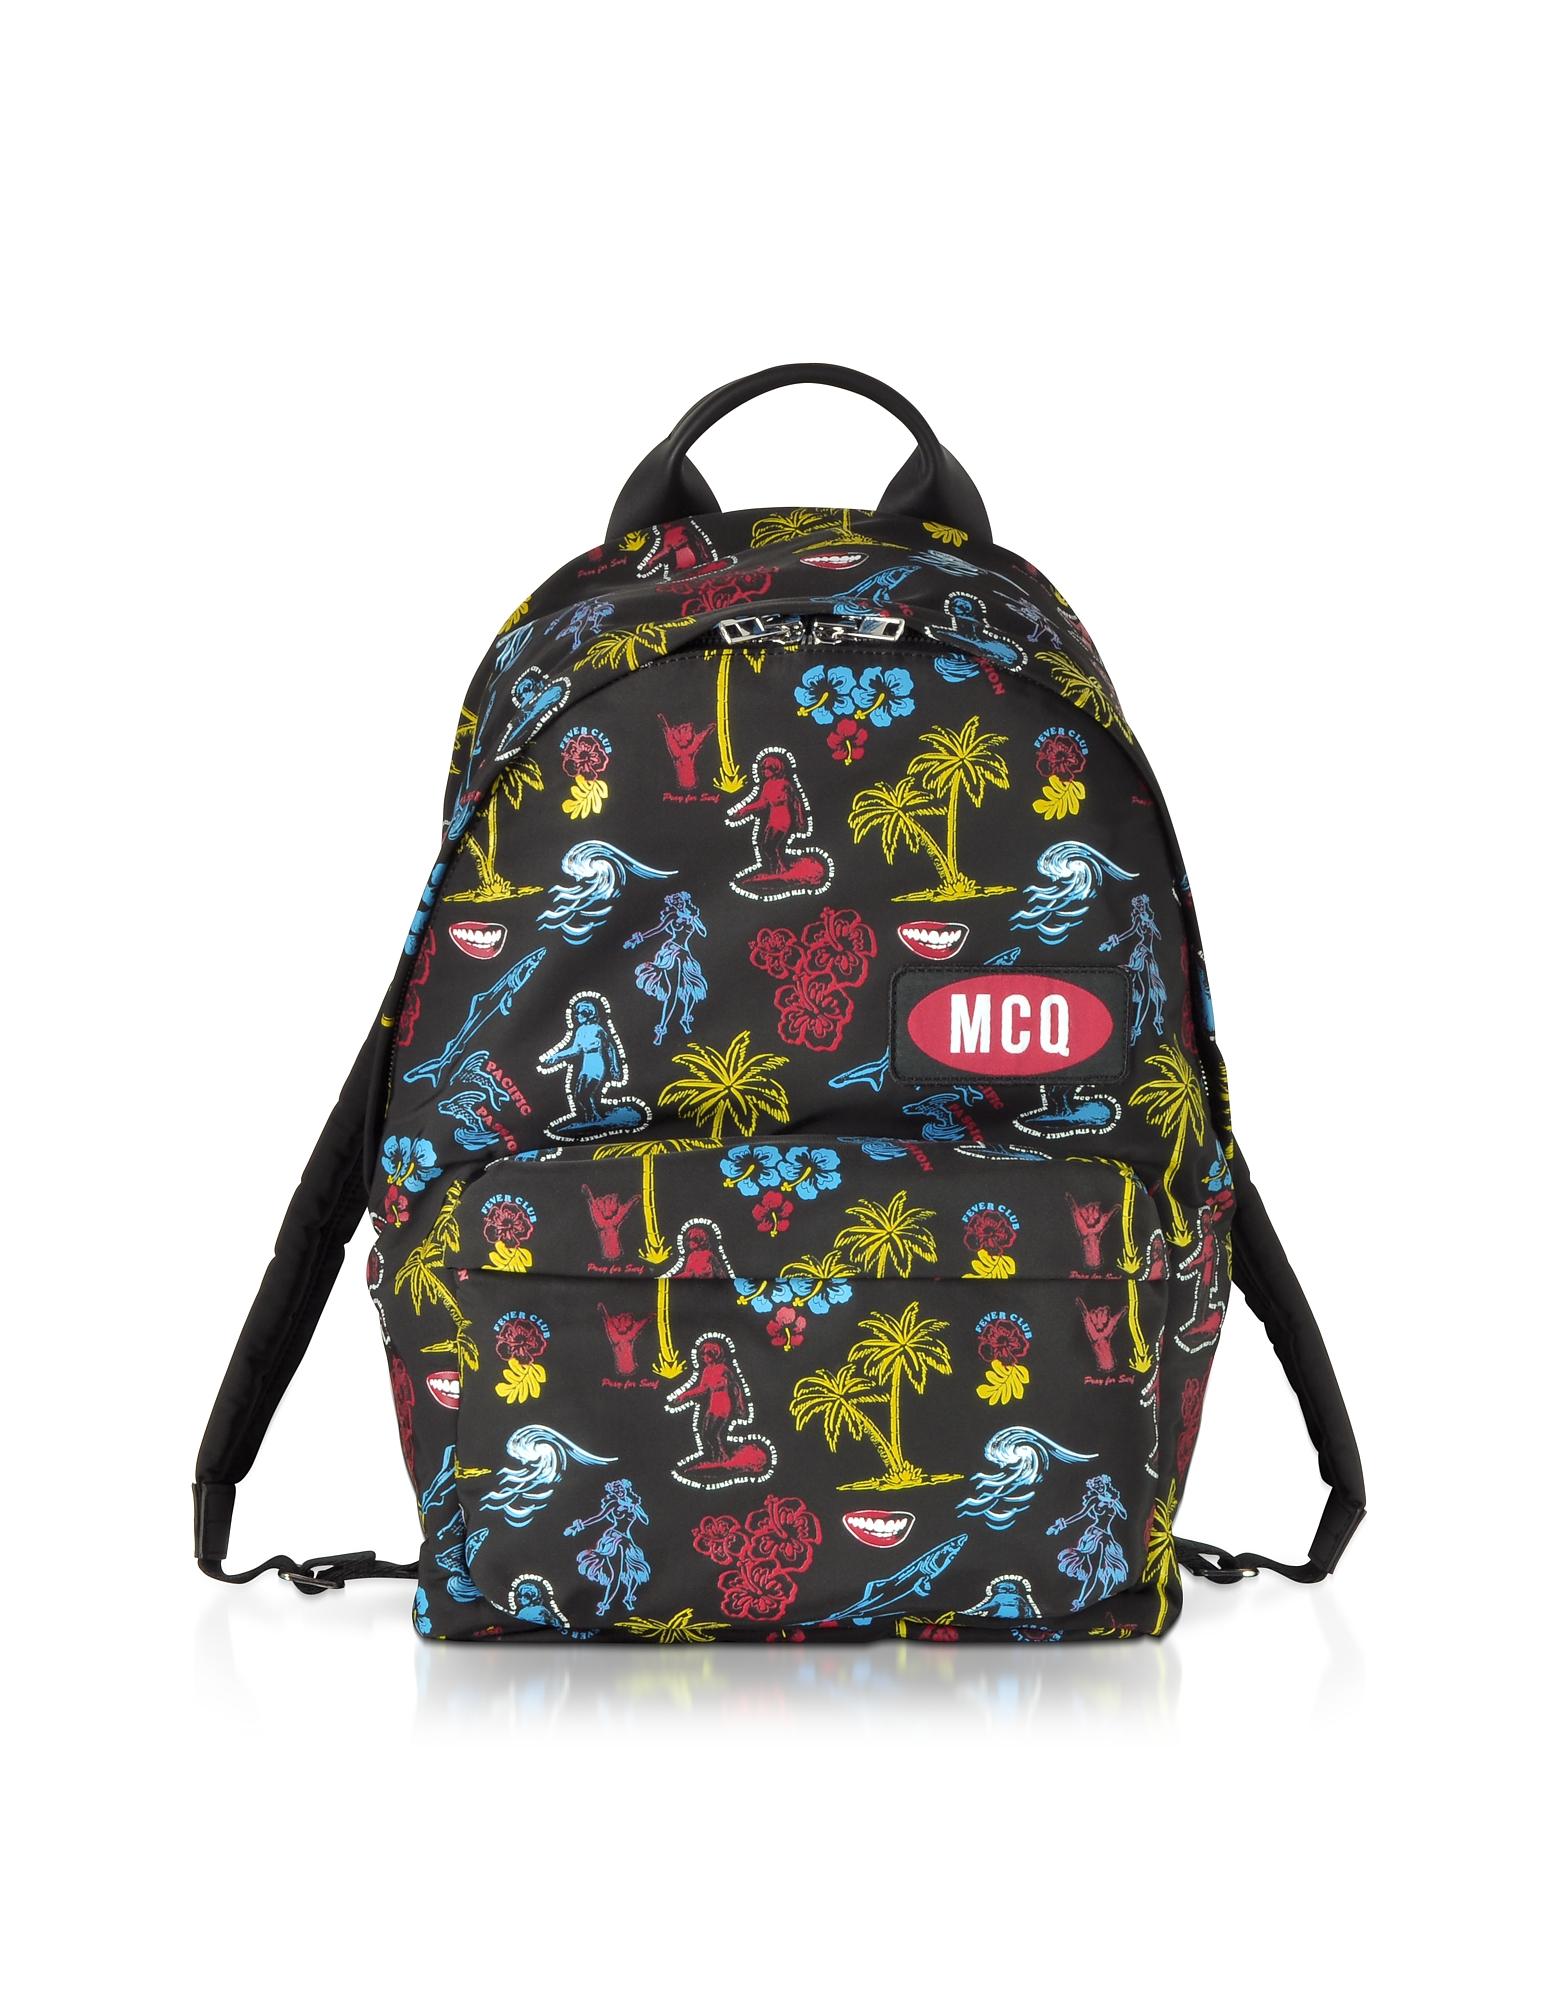 McQ Alexander McQueen Designer Men's Bags, Darkest Black Printed Nylon Classic Backpack